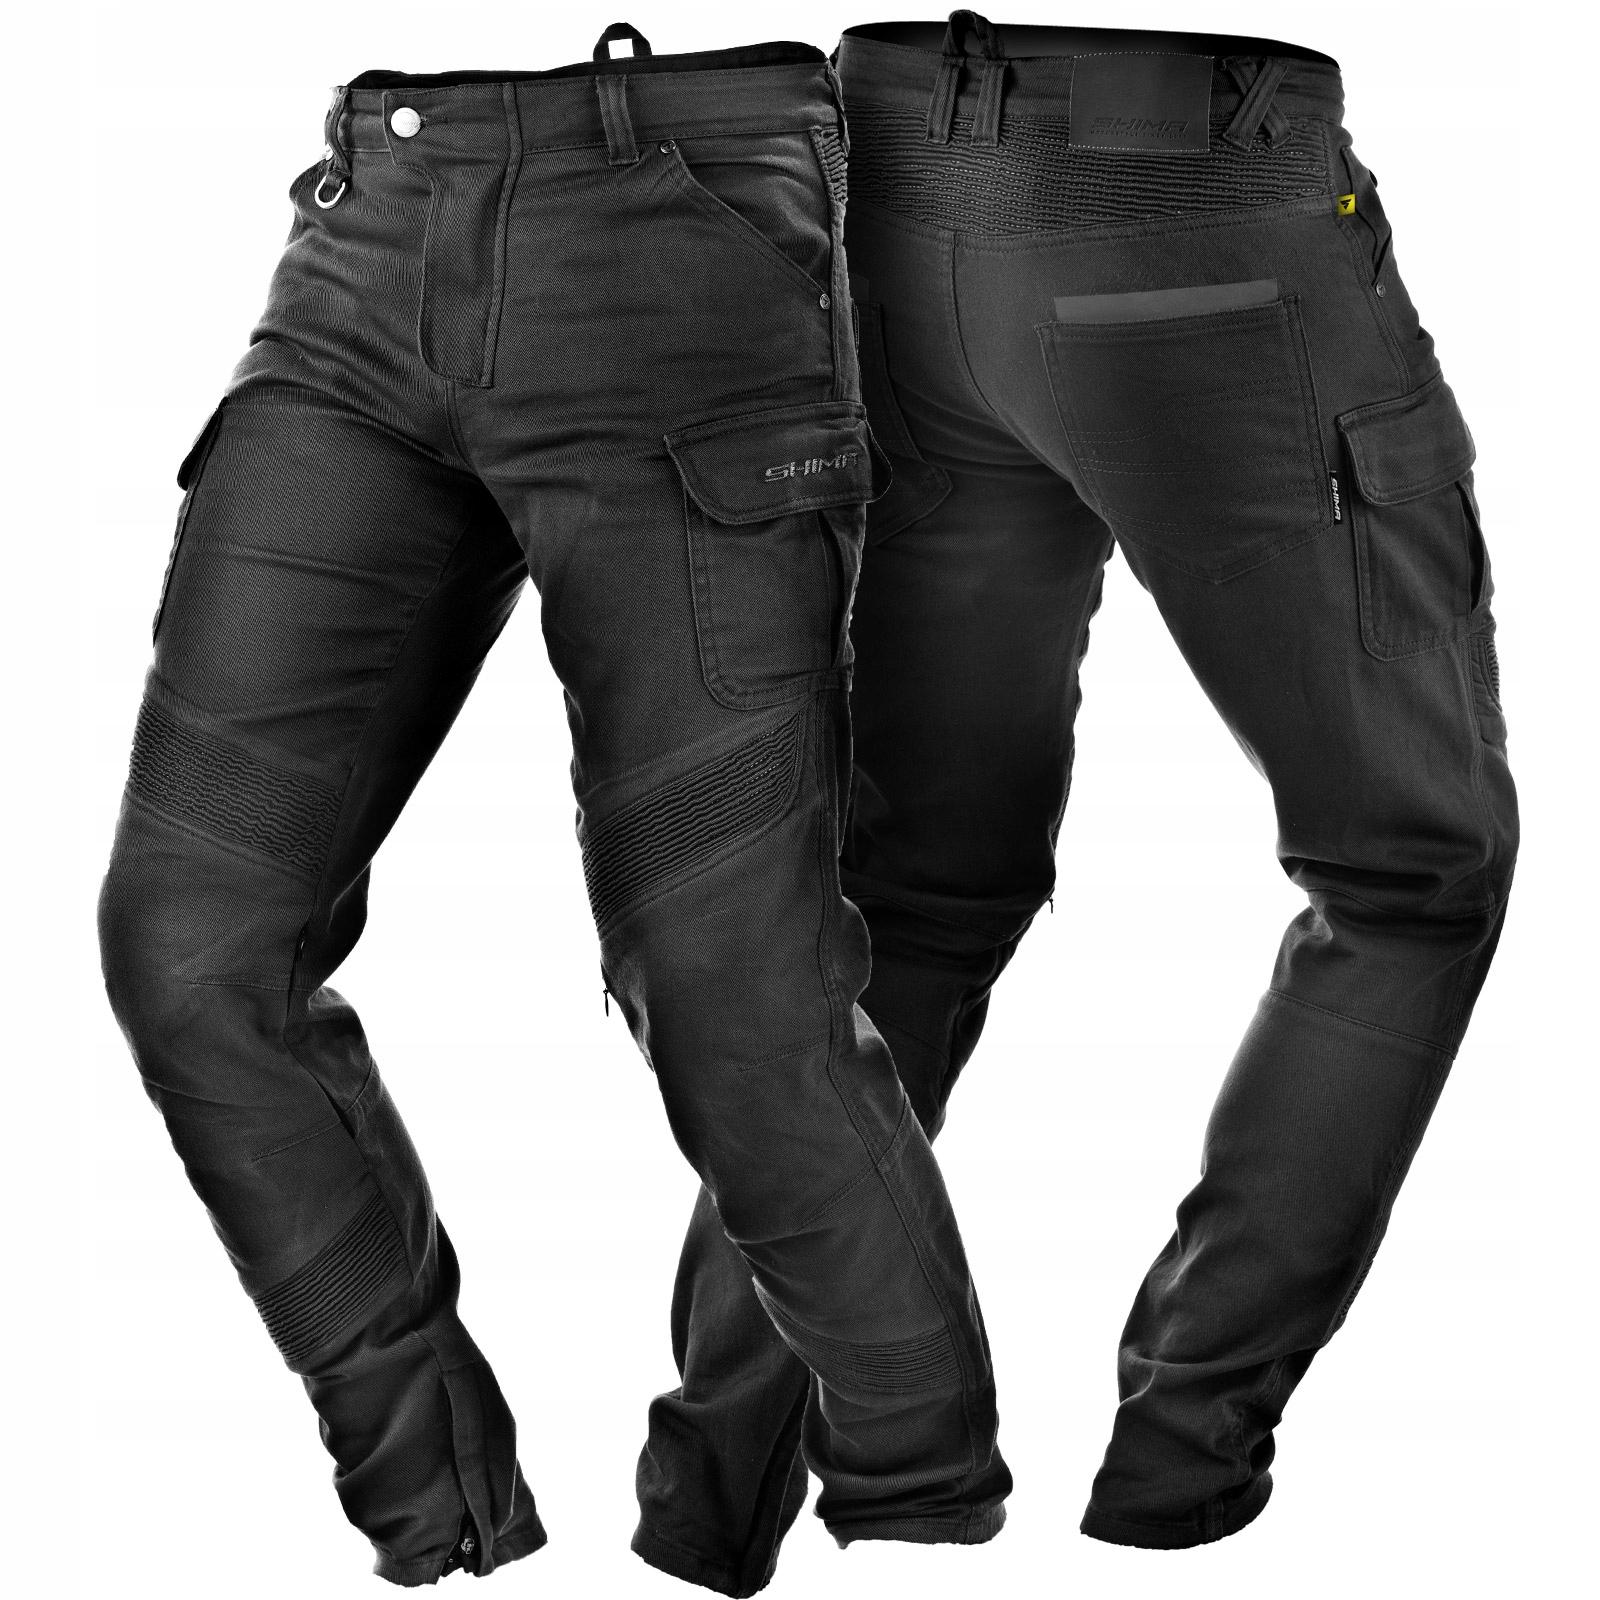 Мотоциклетные брюки SHIMA GIRO + FREE